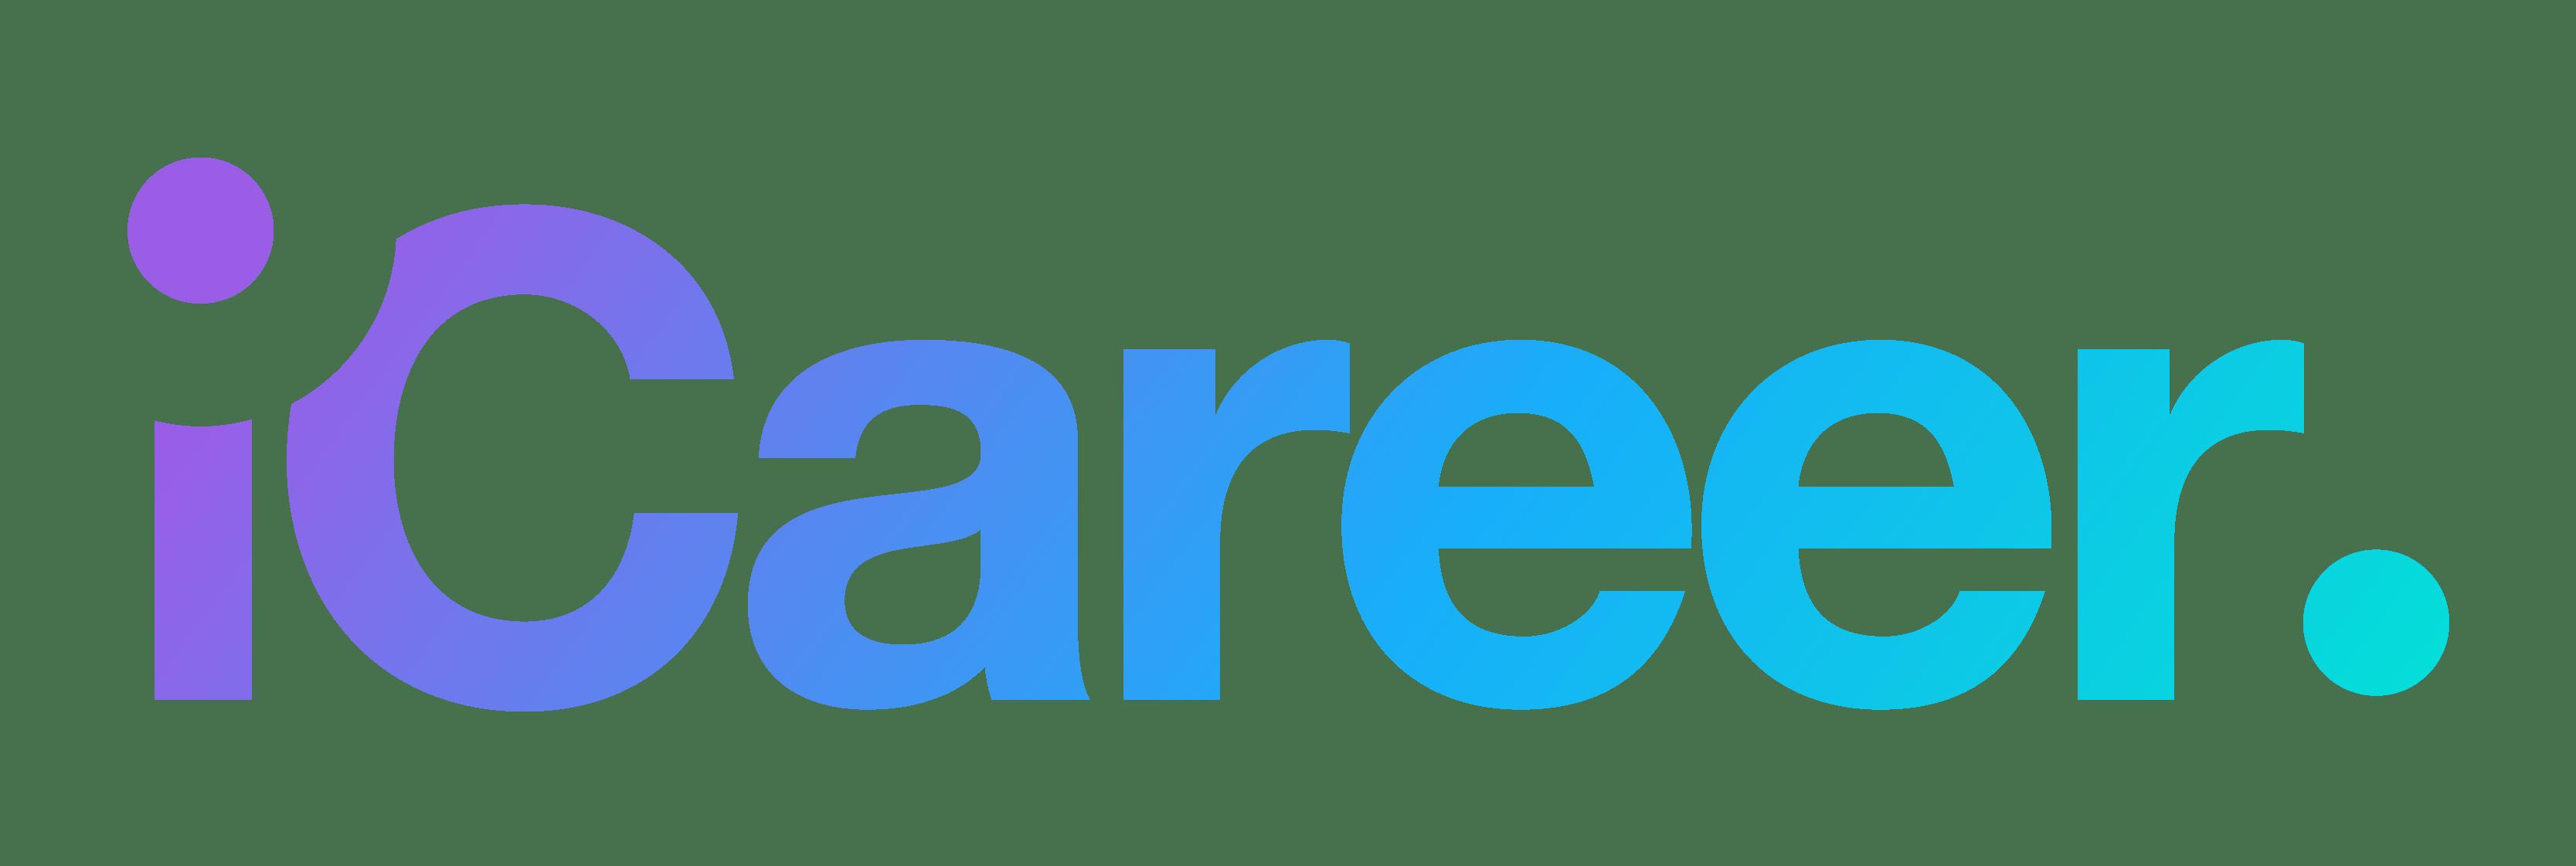 iCareer_colour-Logo